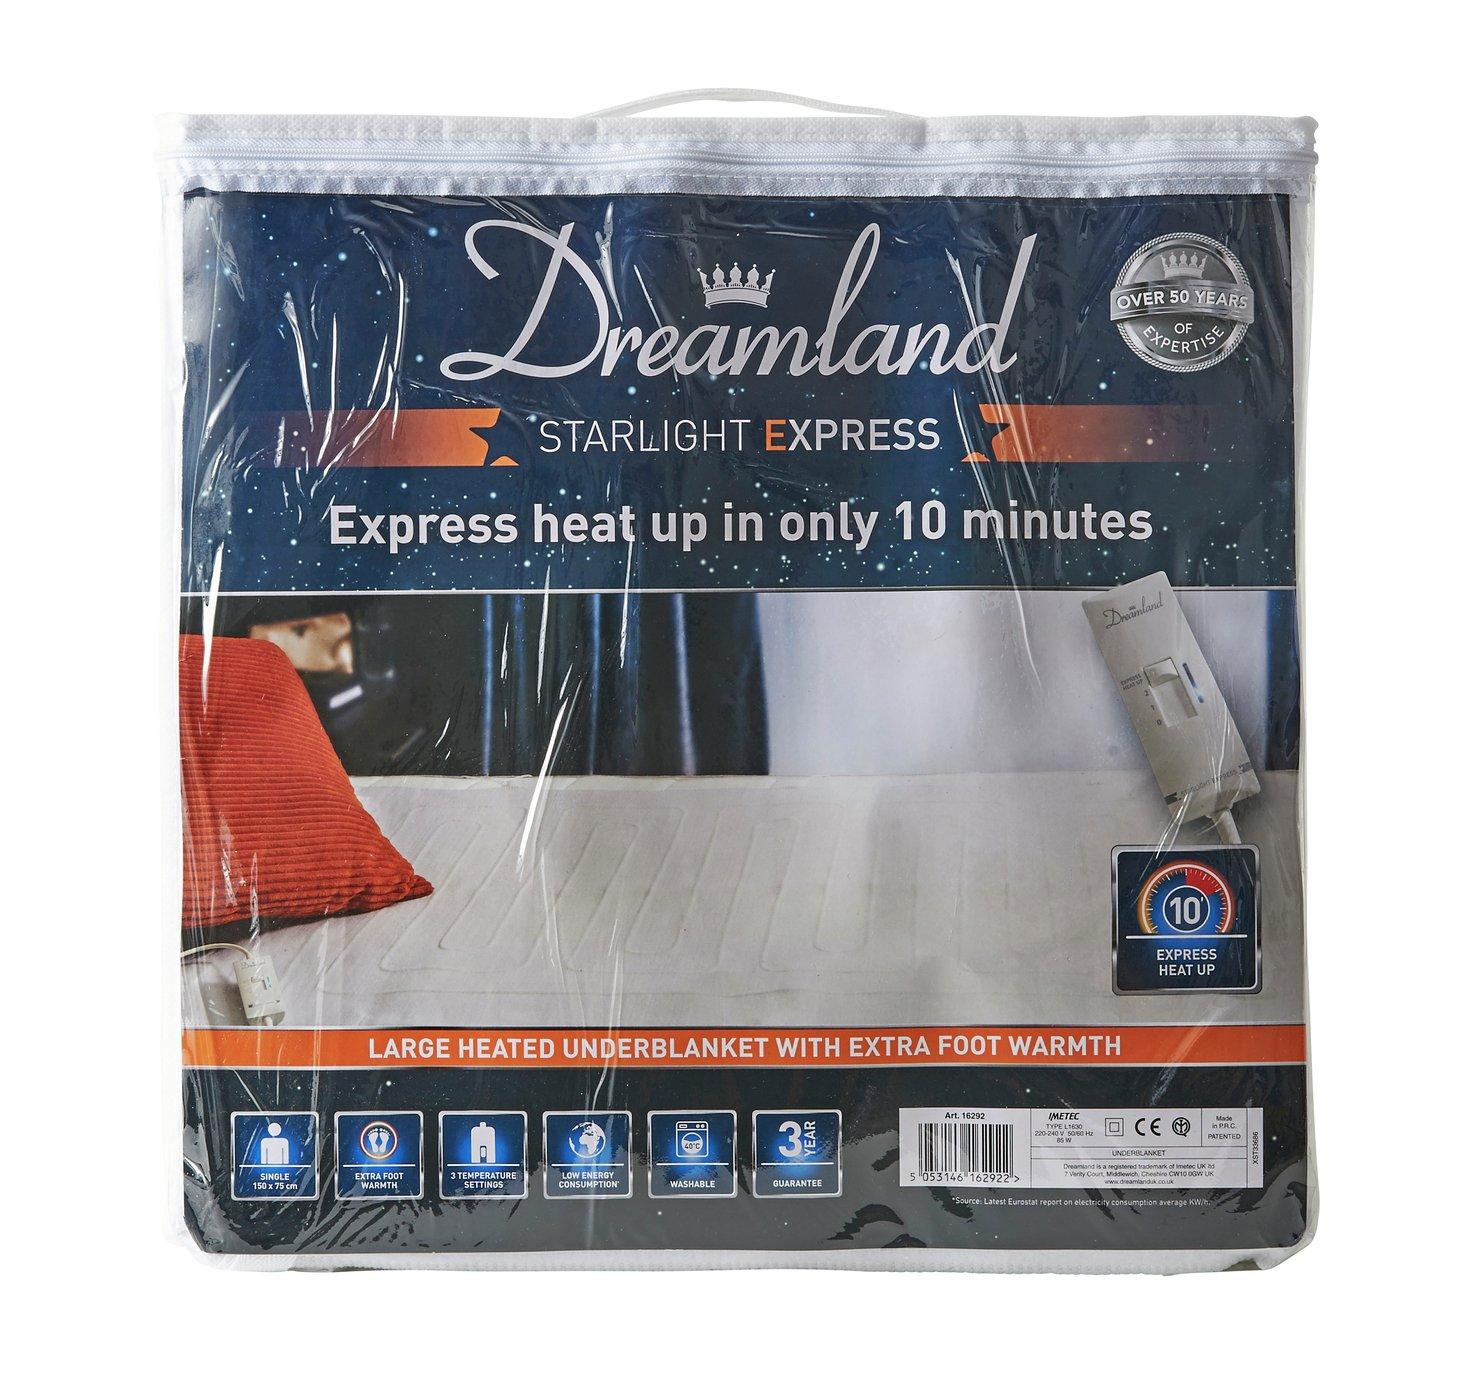 Dreamland Starlight Express Heated Underblanket - Single